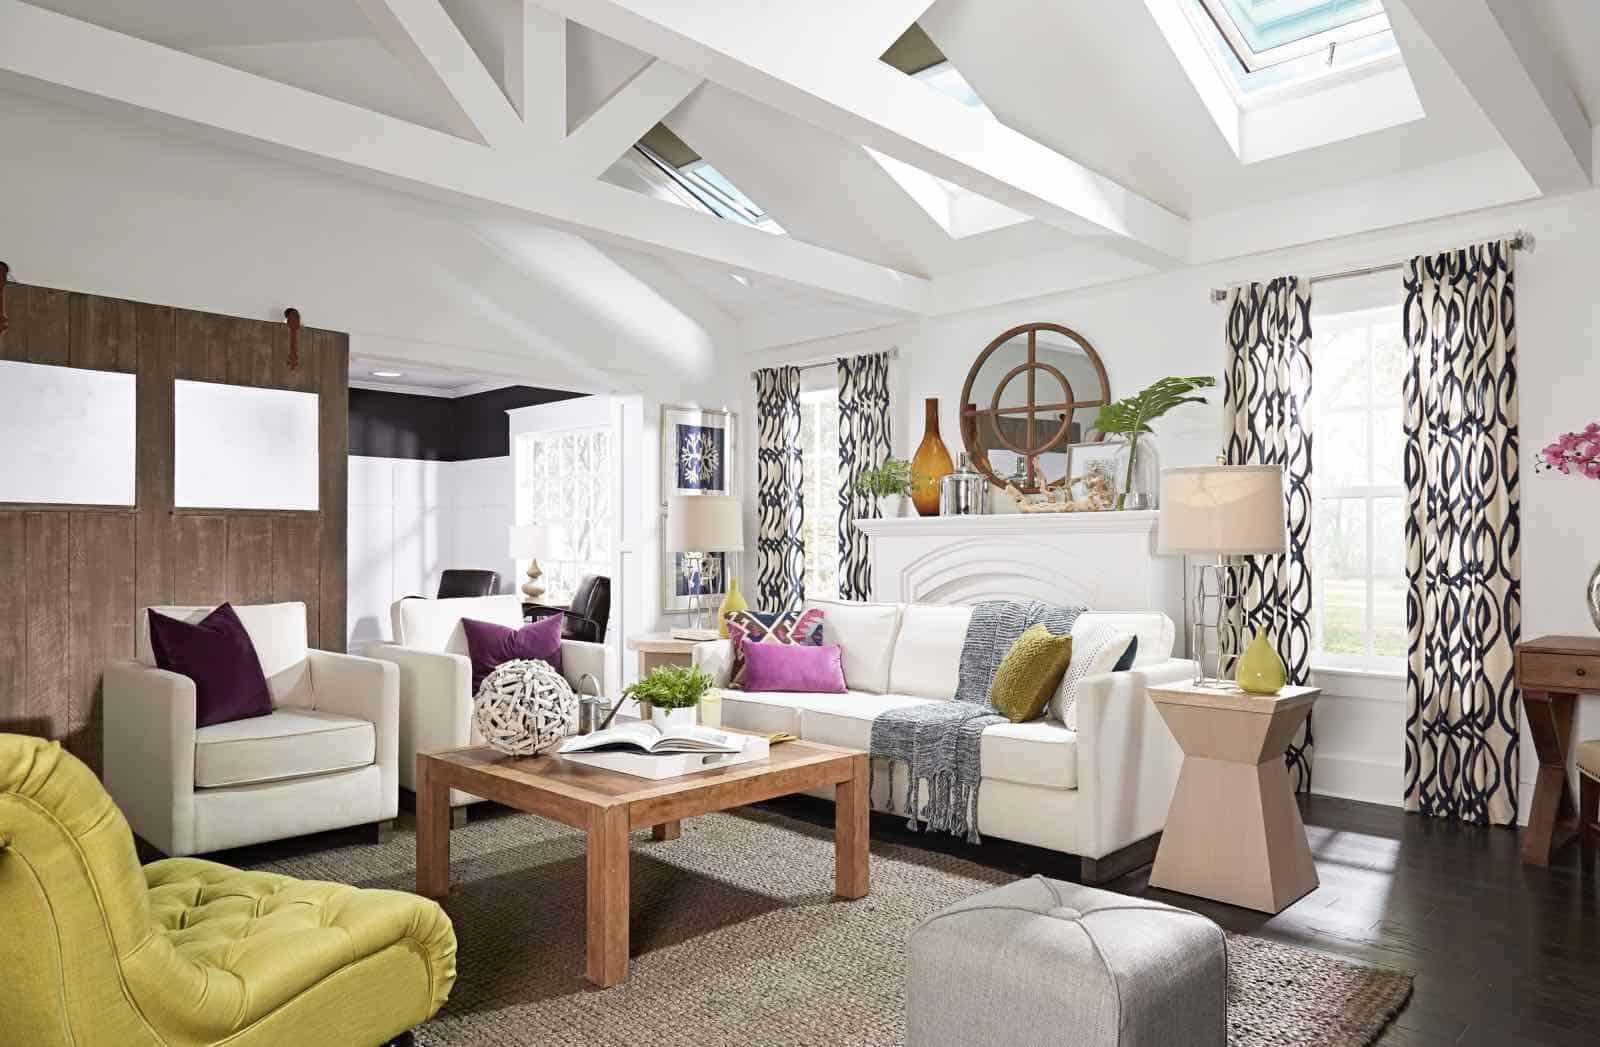 skylight inspiration